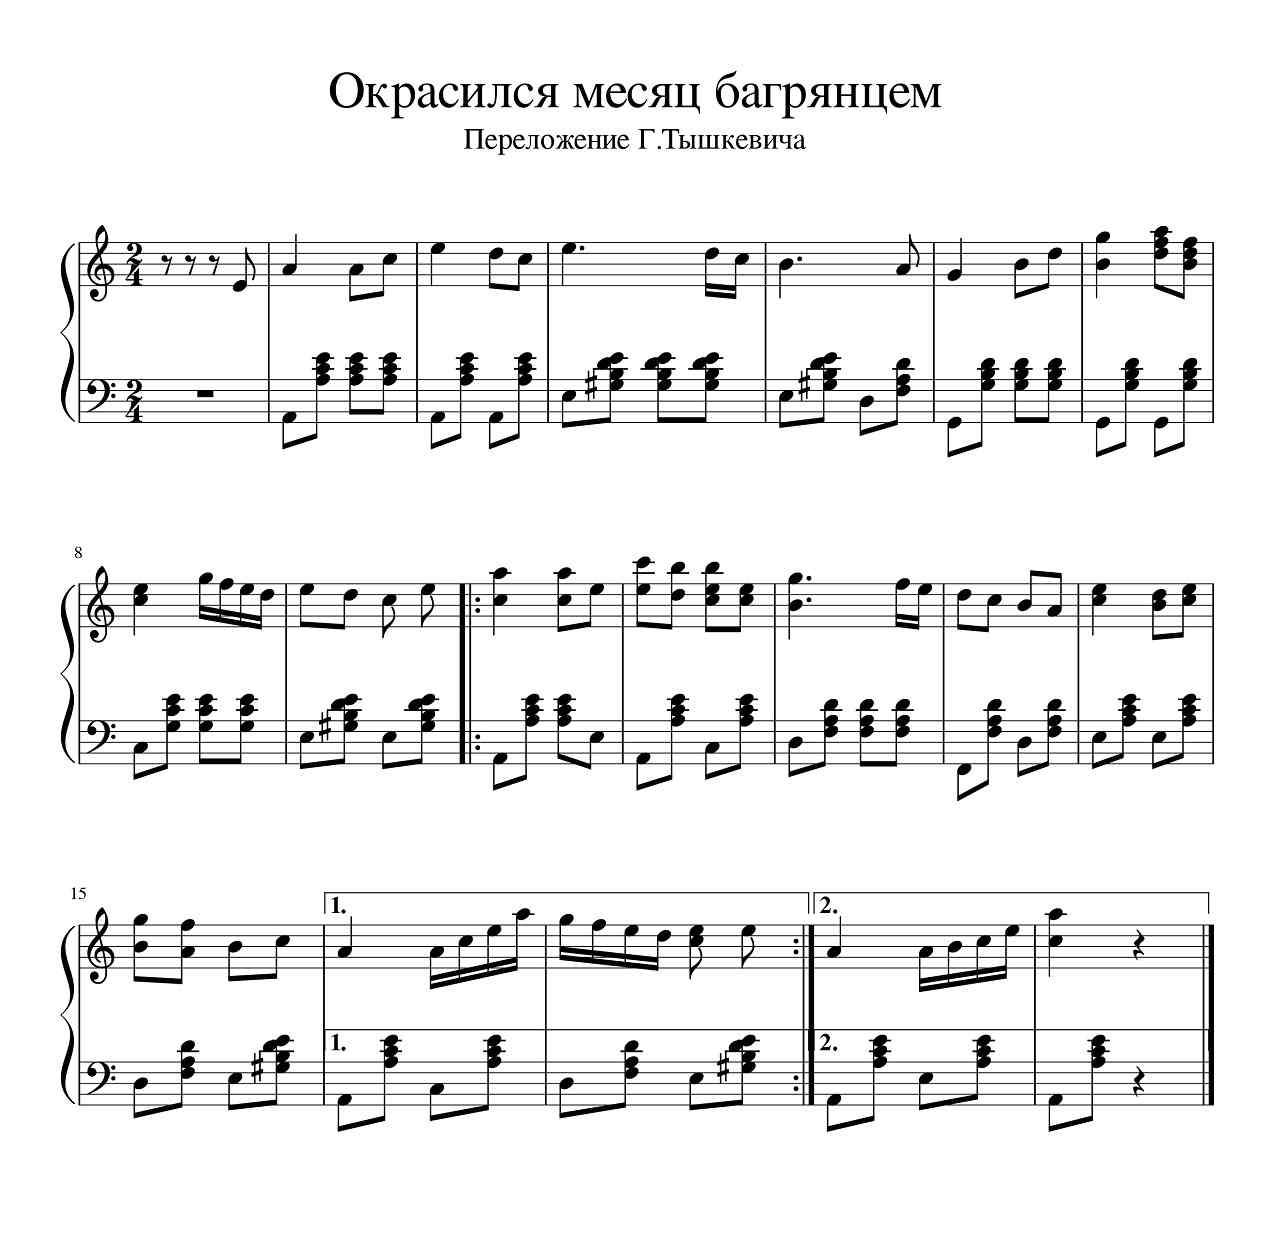 Окрасился месяц багрянцем(ноты для гармони)